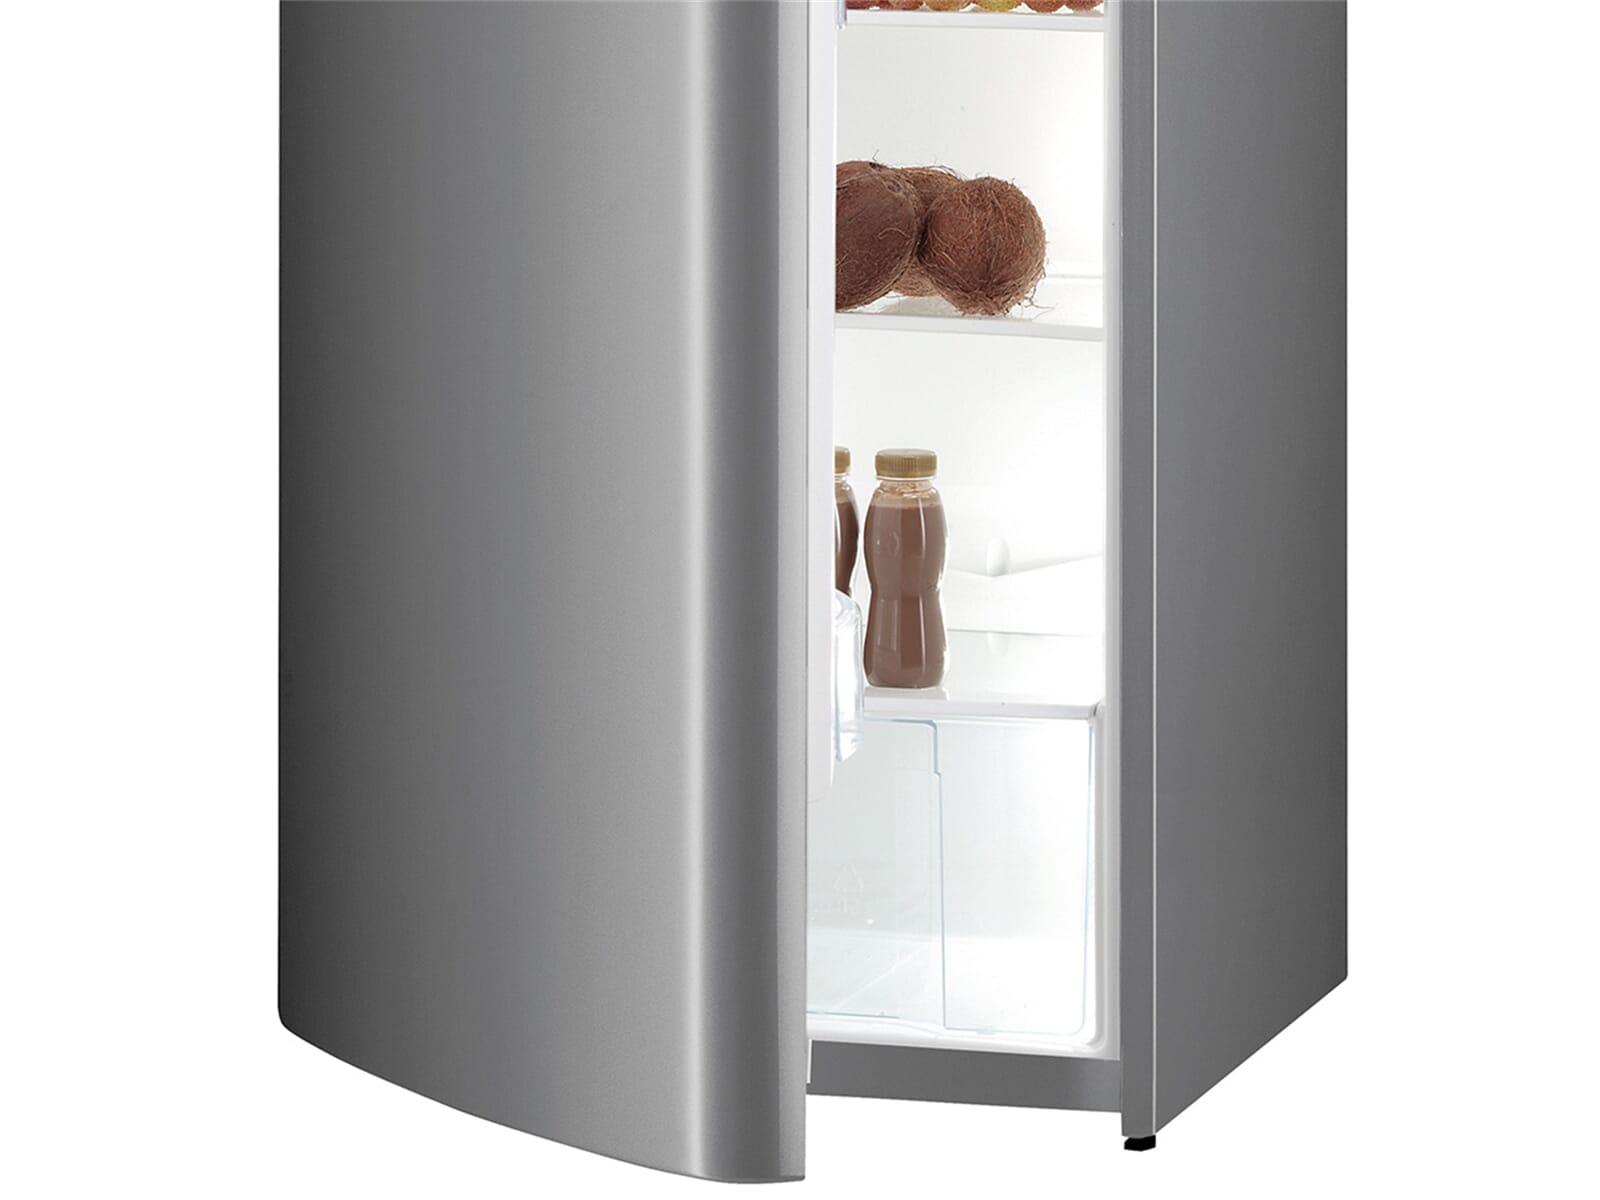 Gorenje Kühlschrank Silber : Gorenje rb ox l standkühlschrank inox